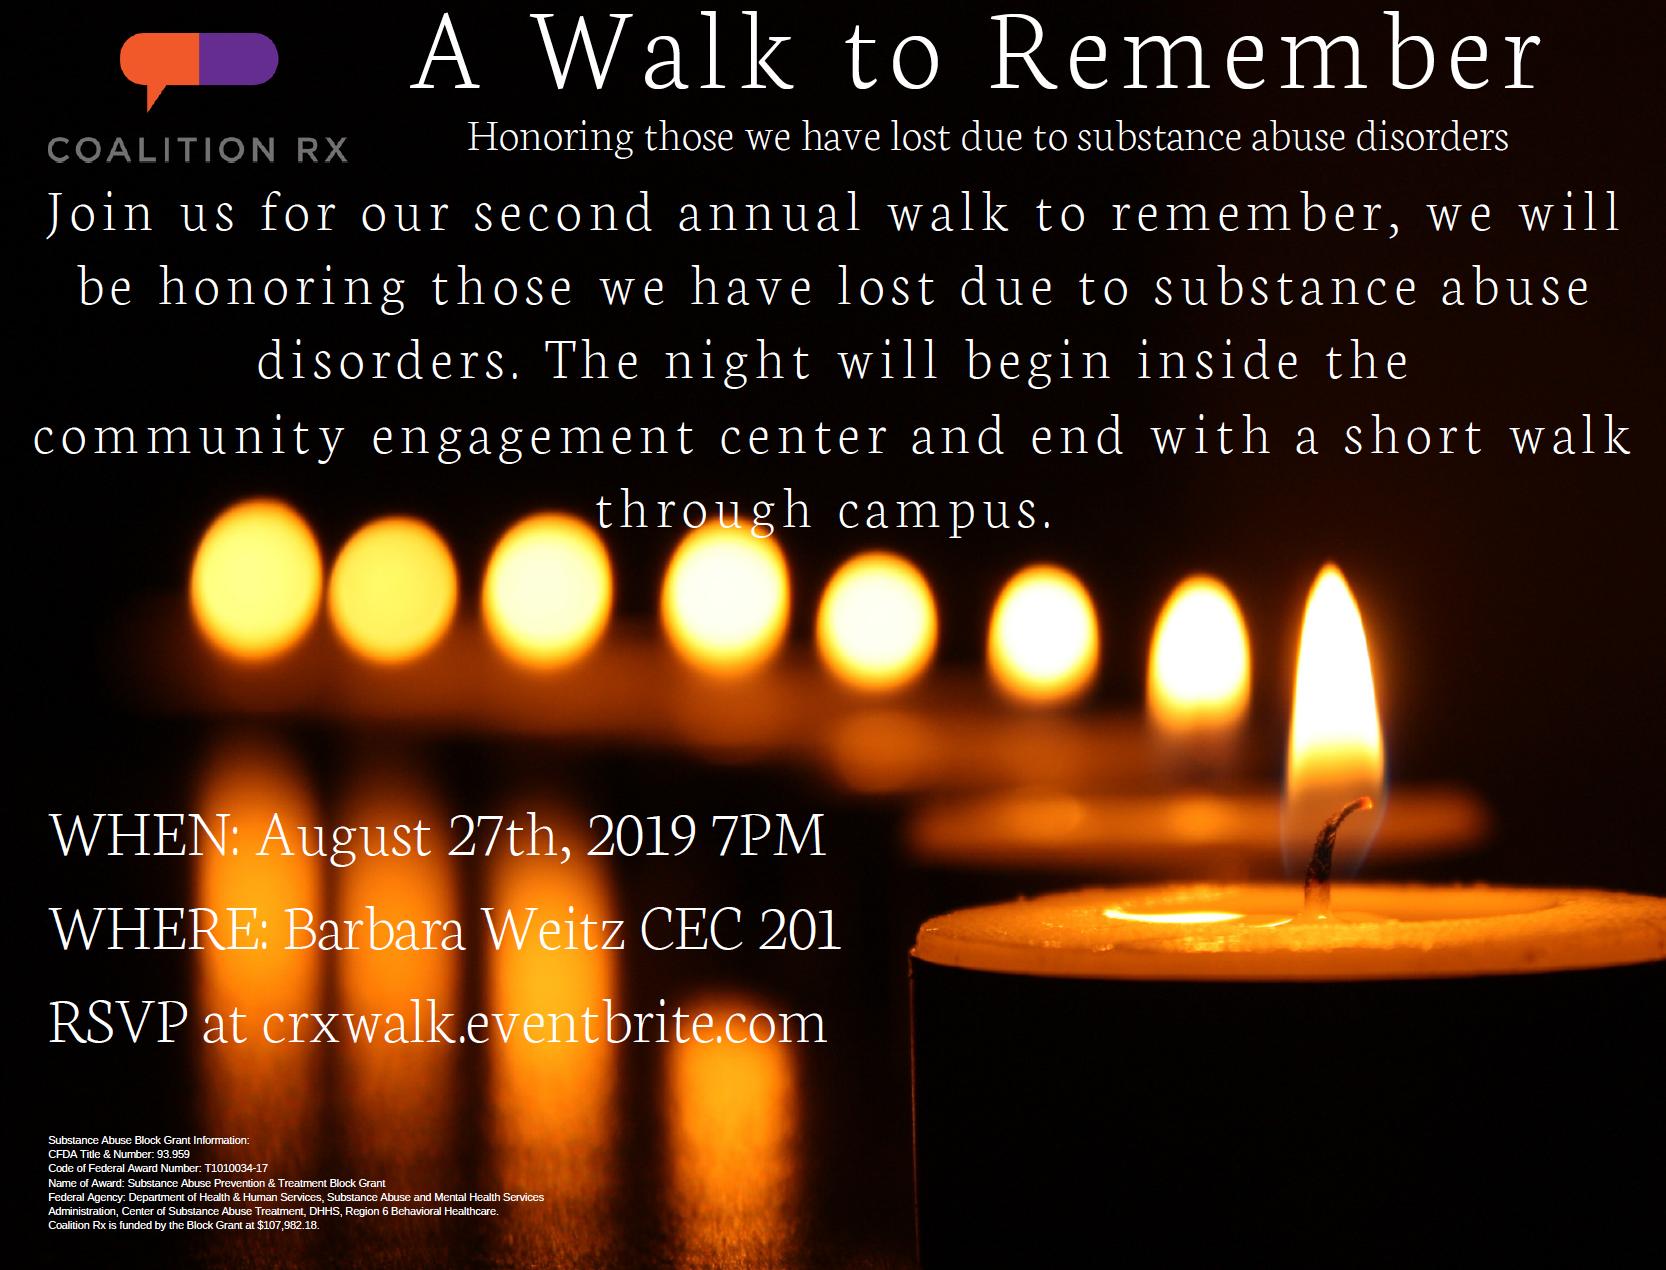 A Walk to Remember-Prayer Walk